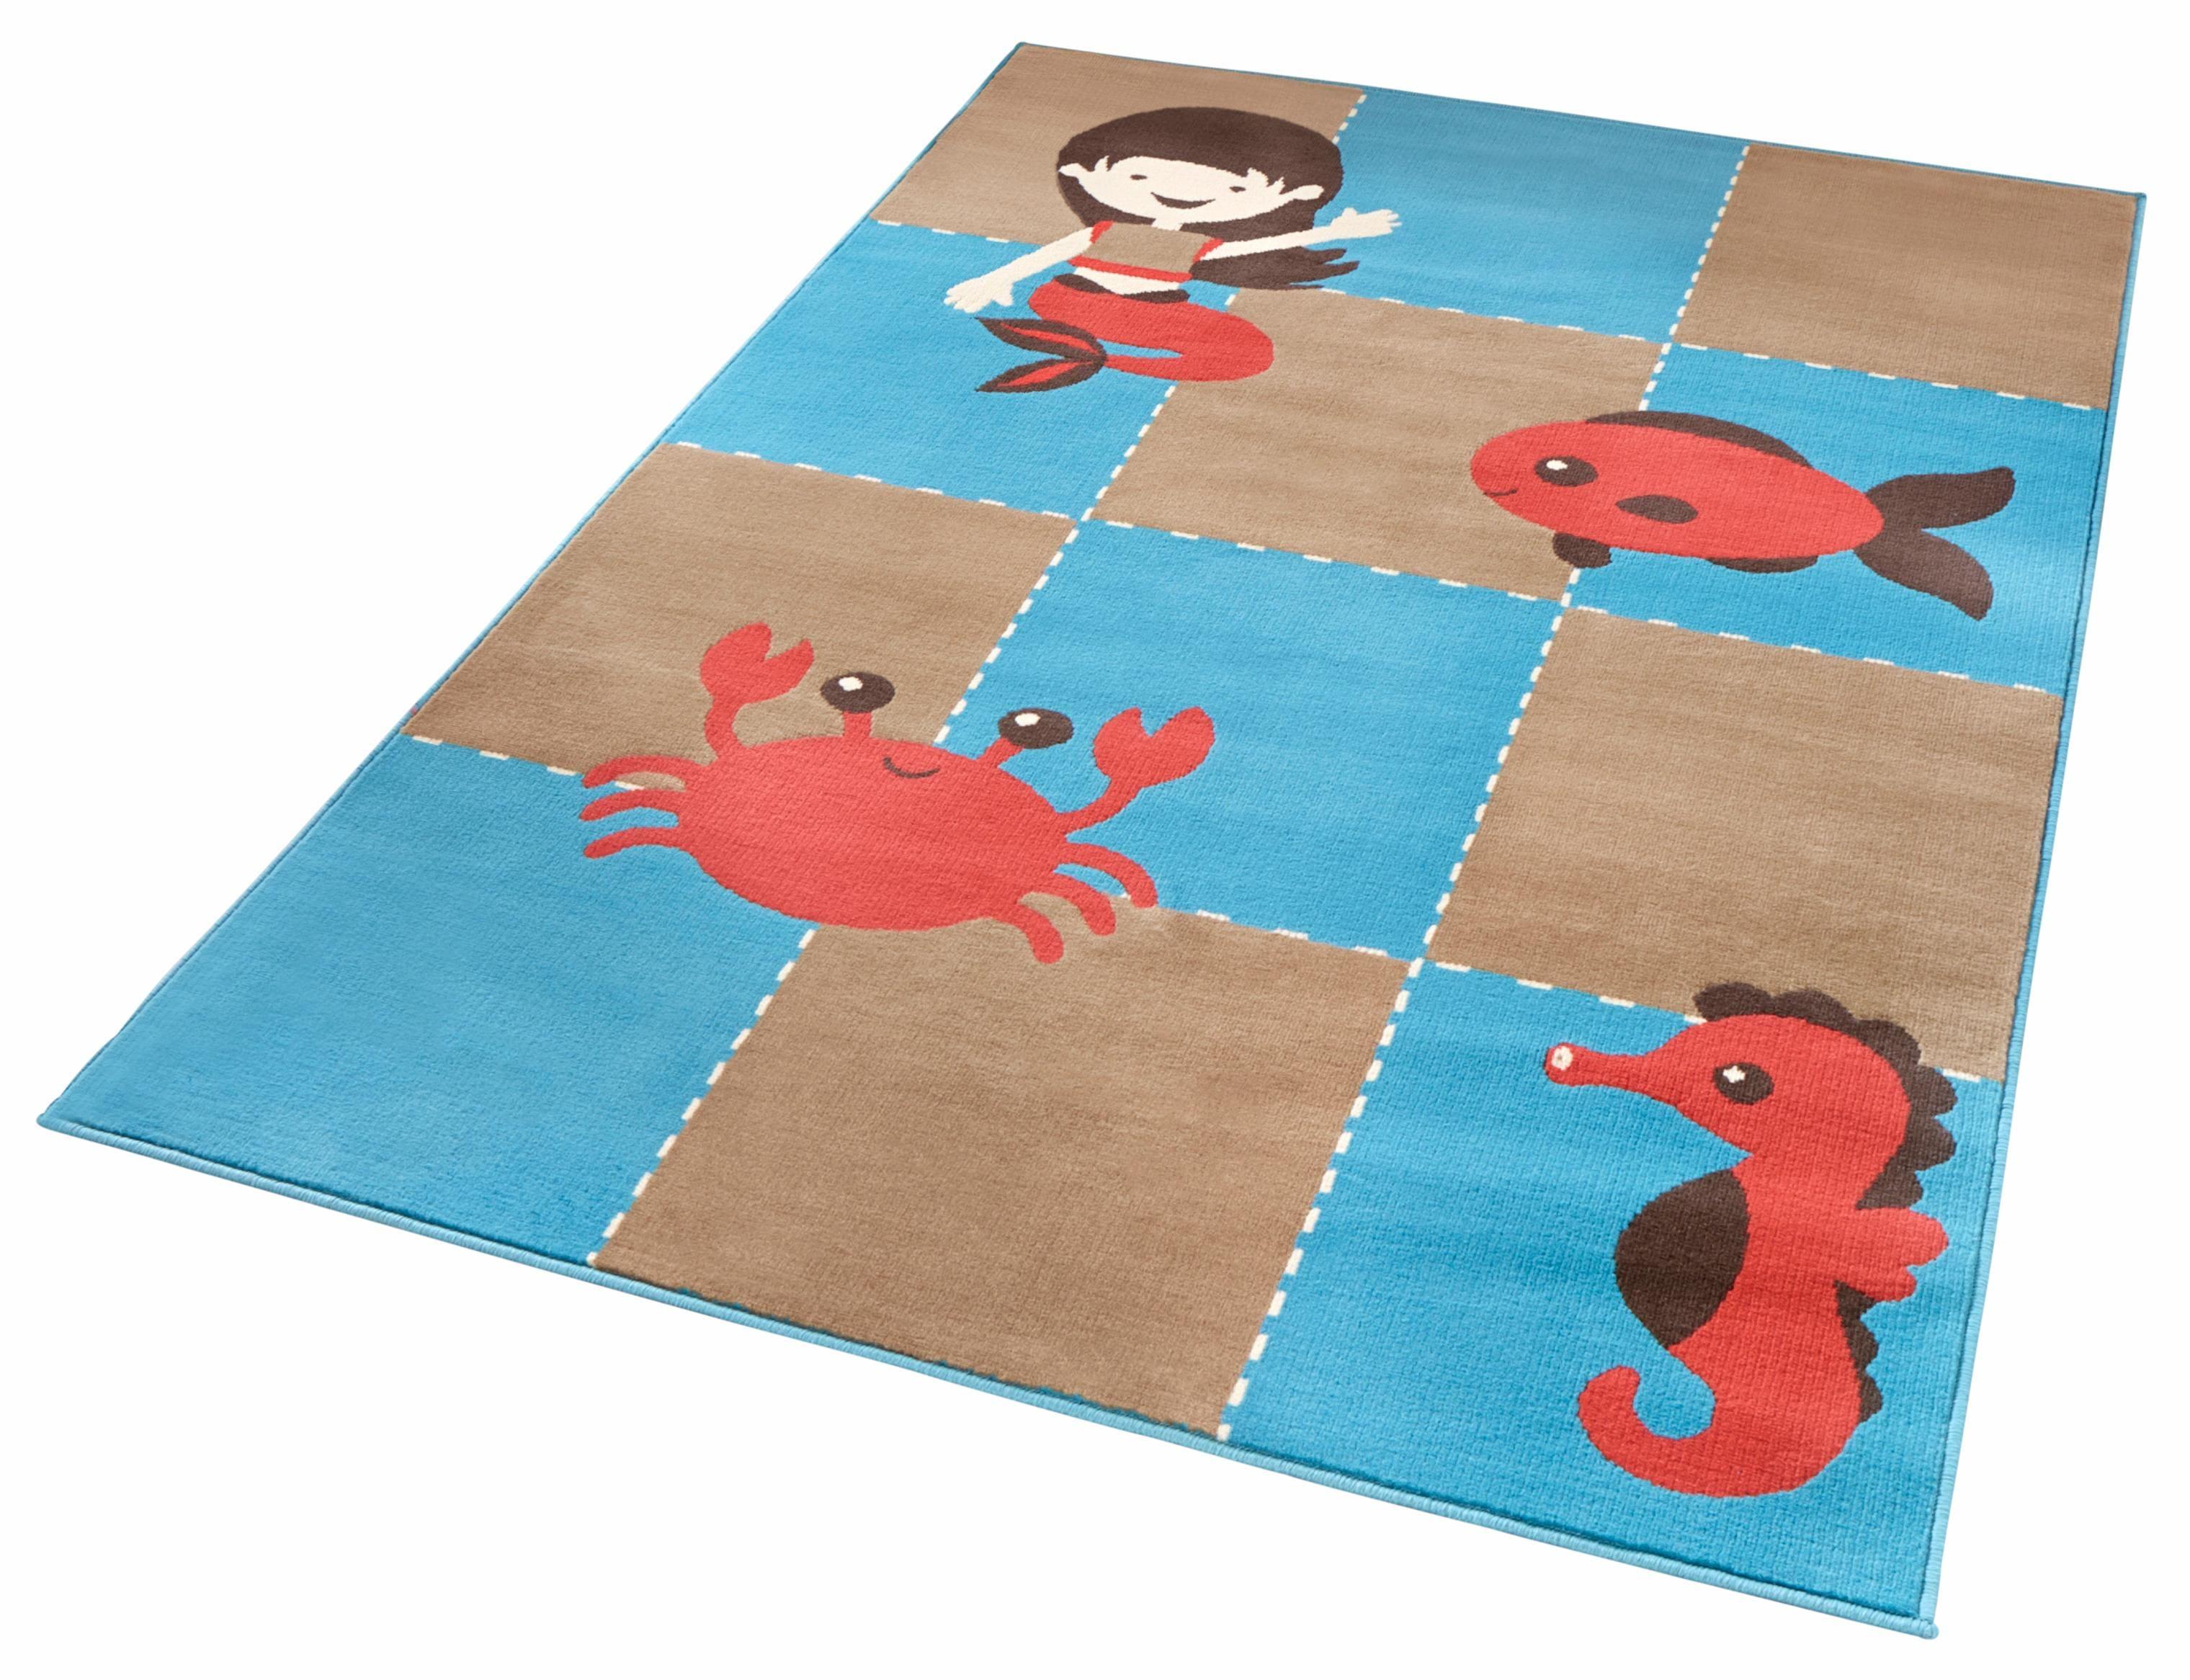 Kinderteppich Meeresbewohner Zala Living rechteckig Höhe 9 mm